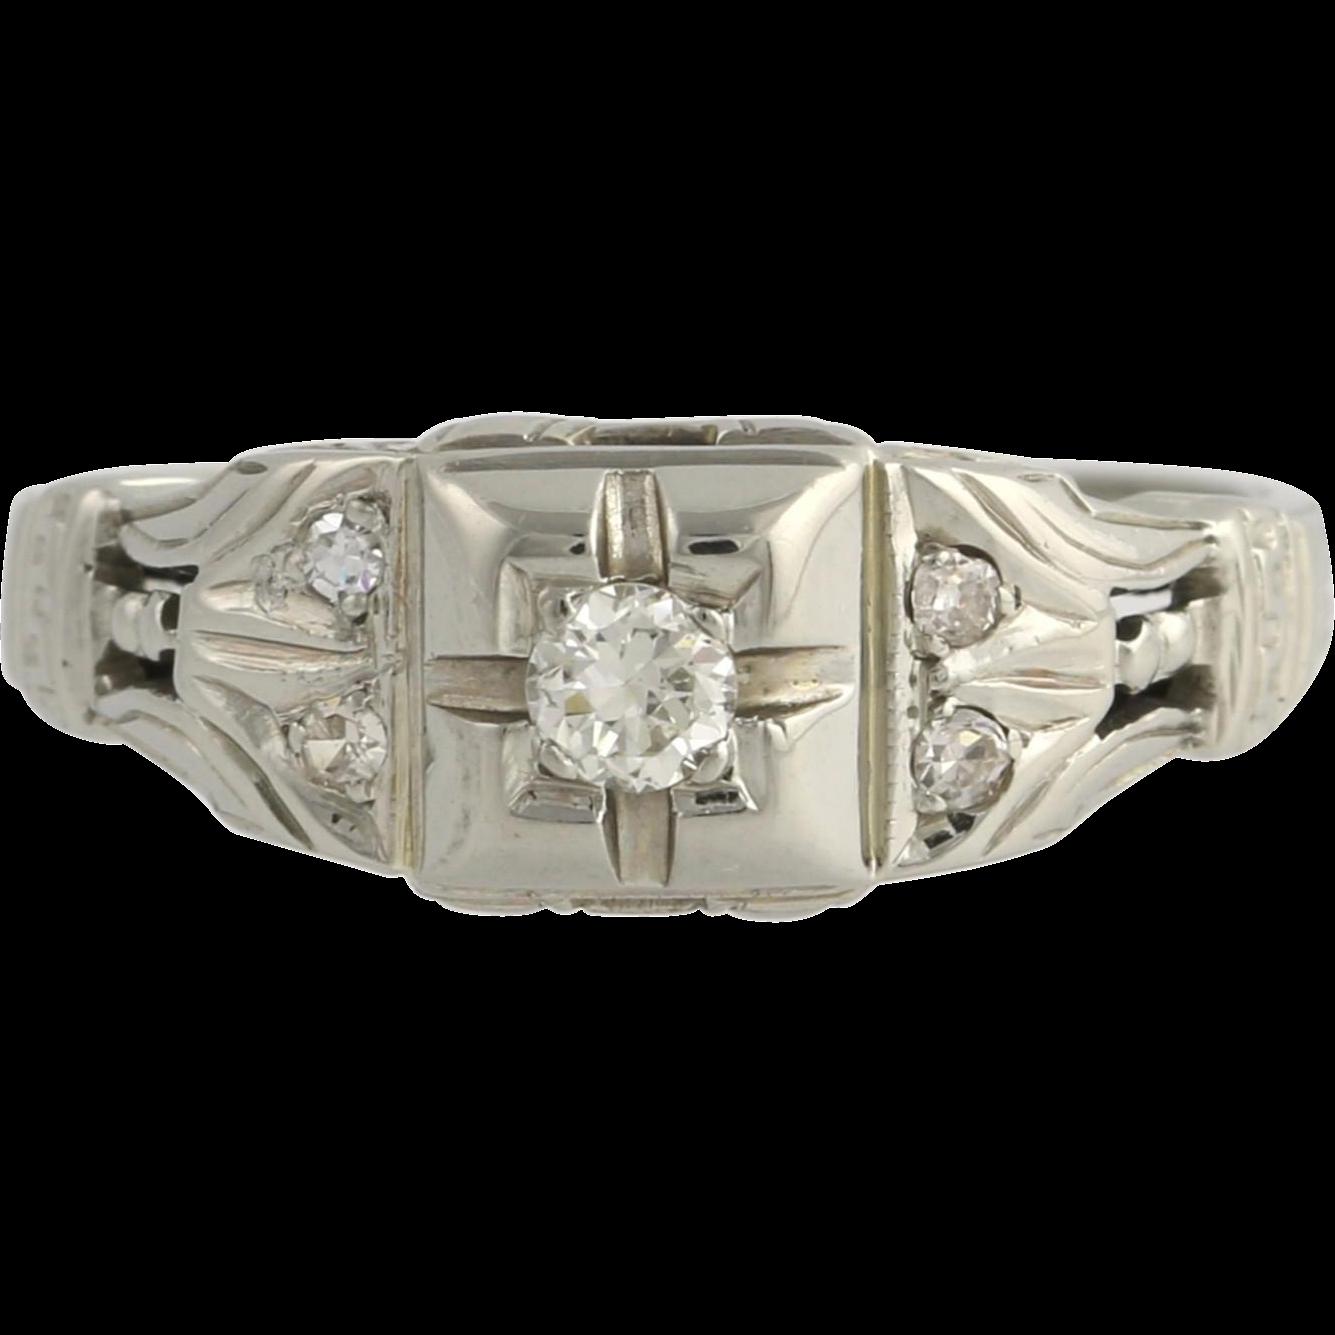 Art Deco Diamond Engagement Ring - 18k White Gold European Cut Genuine .16ctw